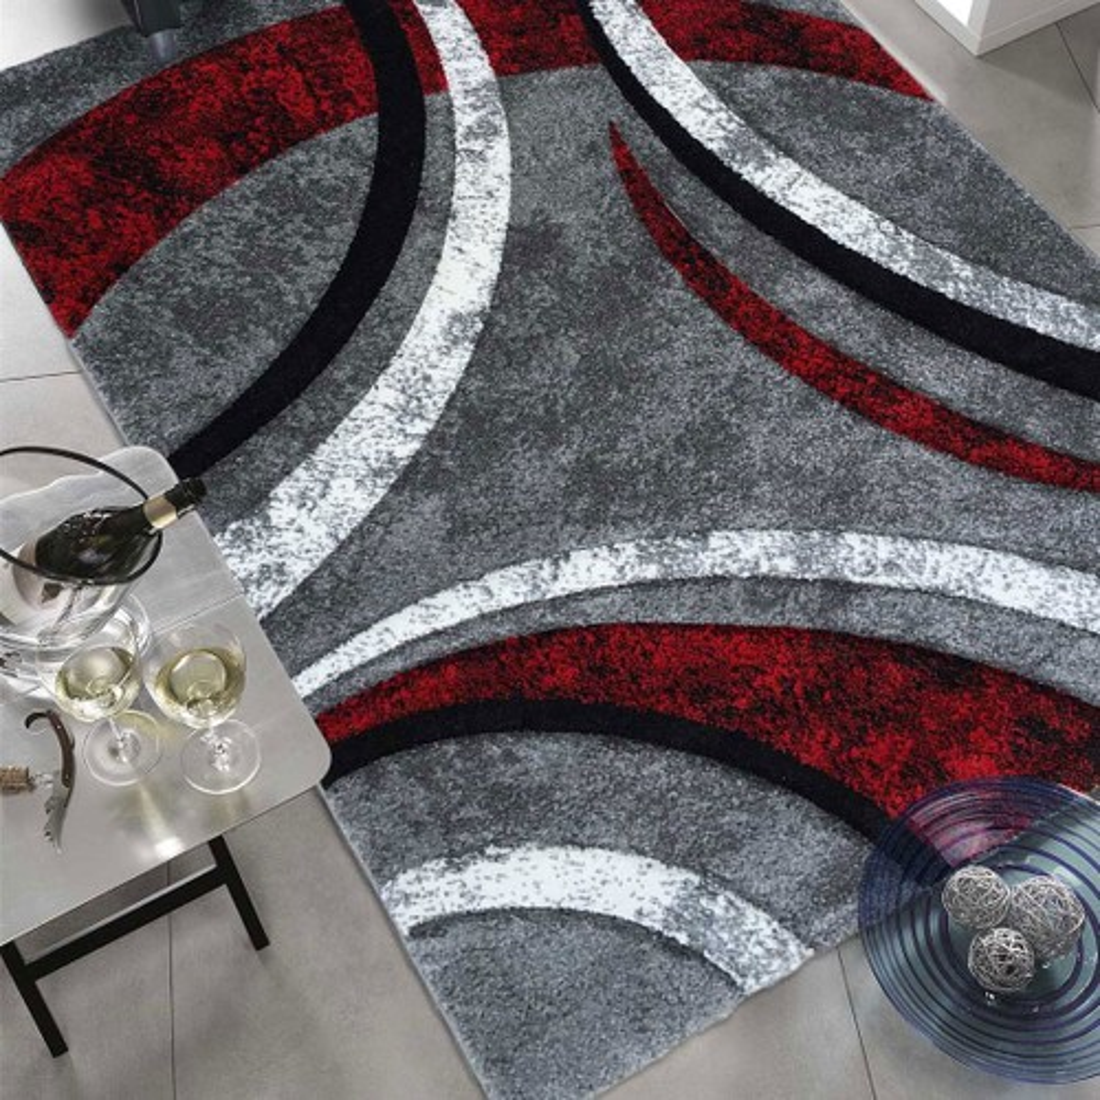 100x100 un amour de tapis tapis rond tapis salon moderne design tapis rond salon poils ras tapis chambre turquoise tapis rond rouge gris